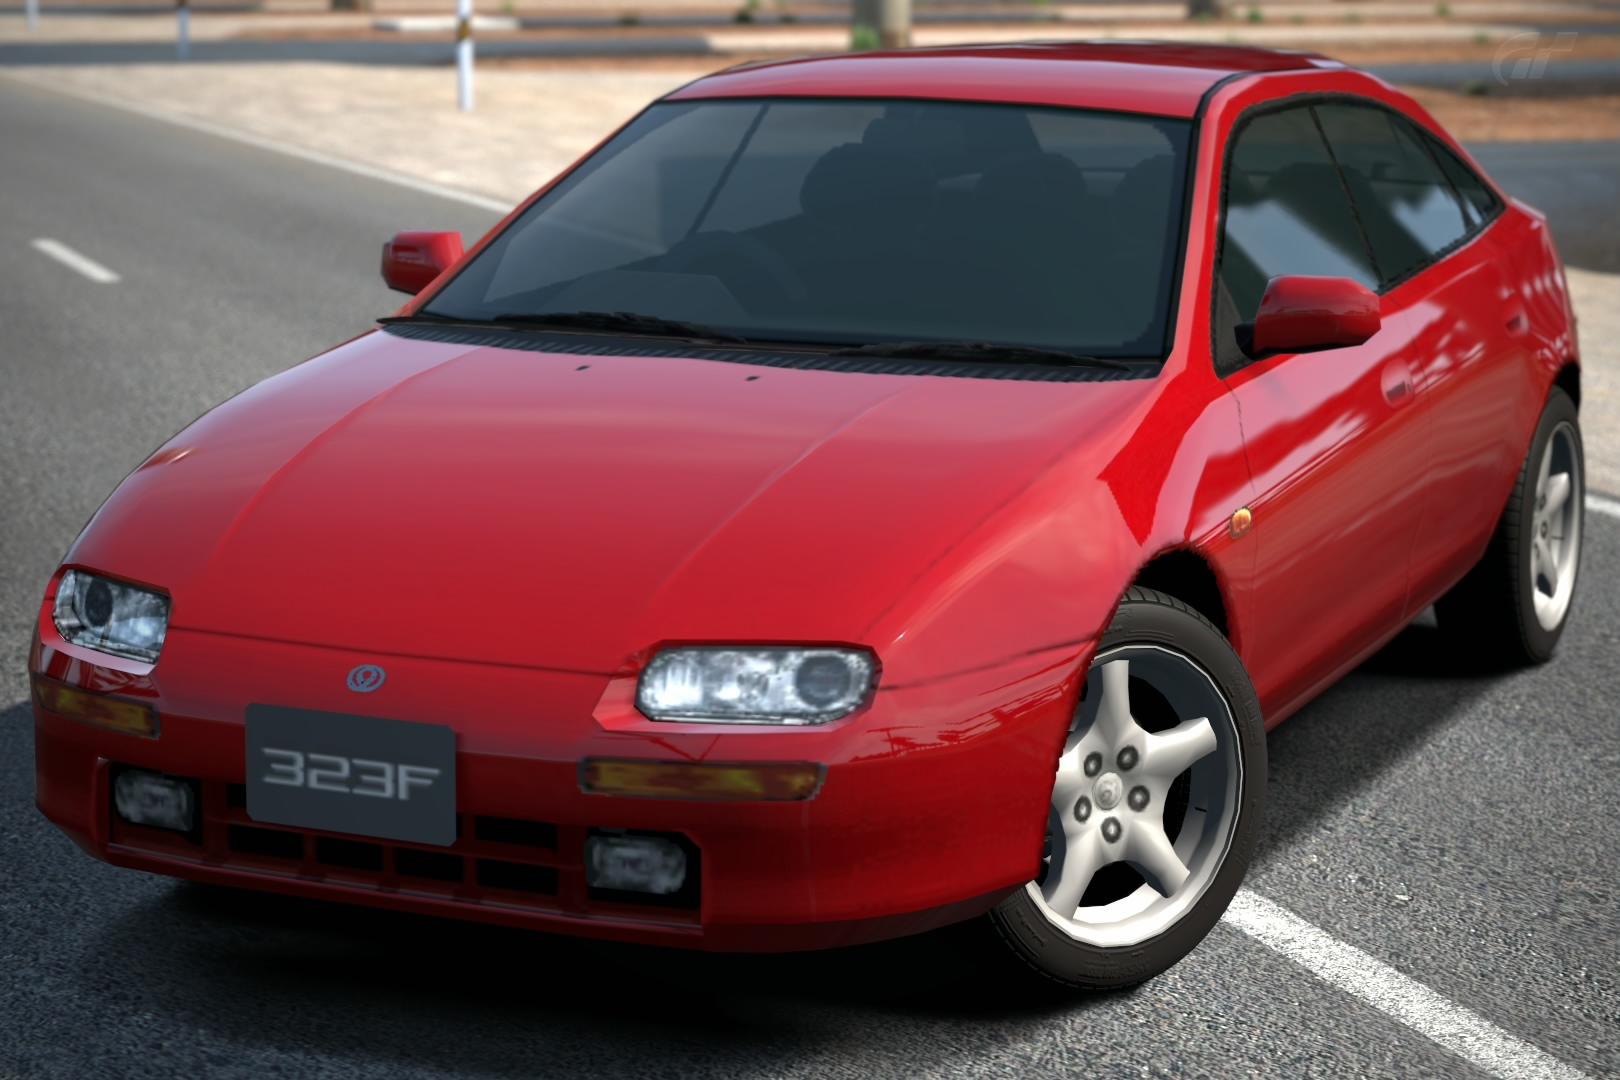 Mazda 323f 93 gran turismo wiki fandom powered by wikia mazda 323f 93 altavistaventures Images